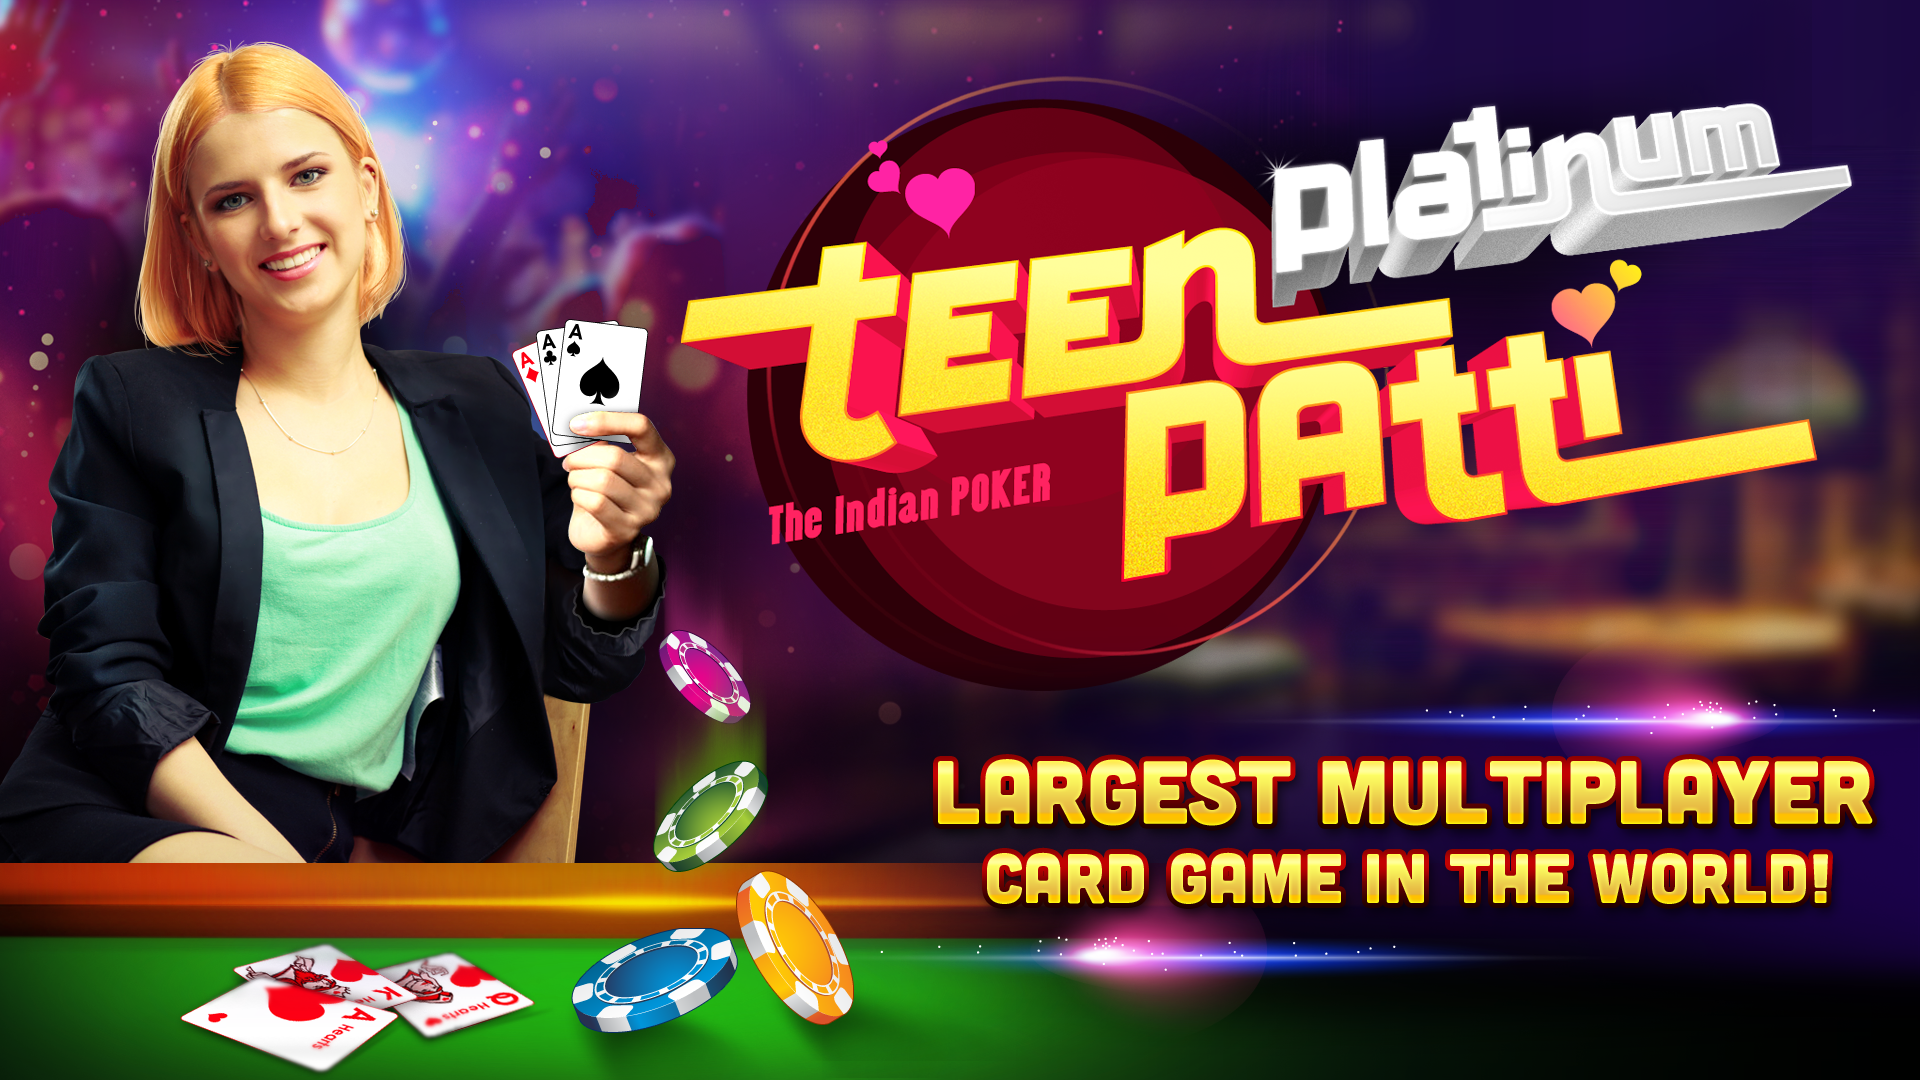 Teen Patti Platinum